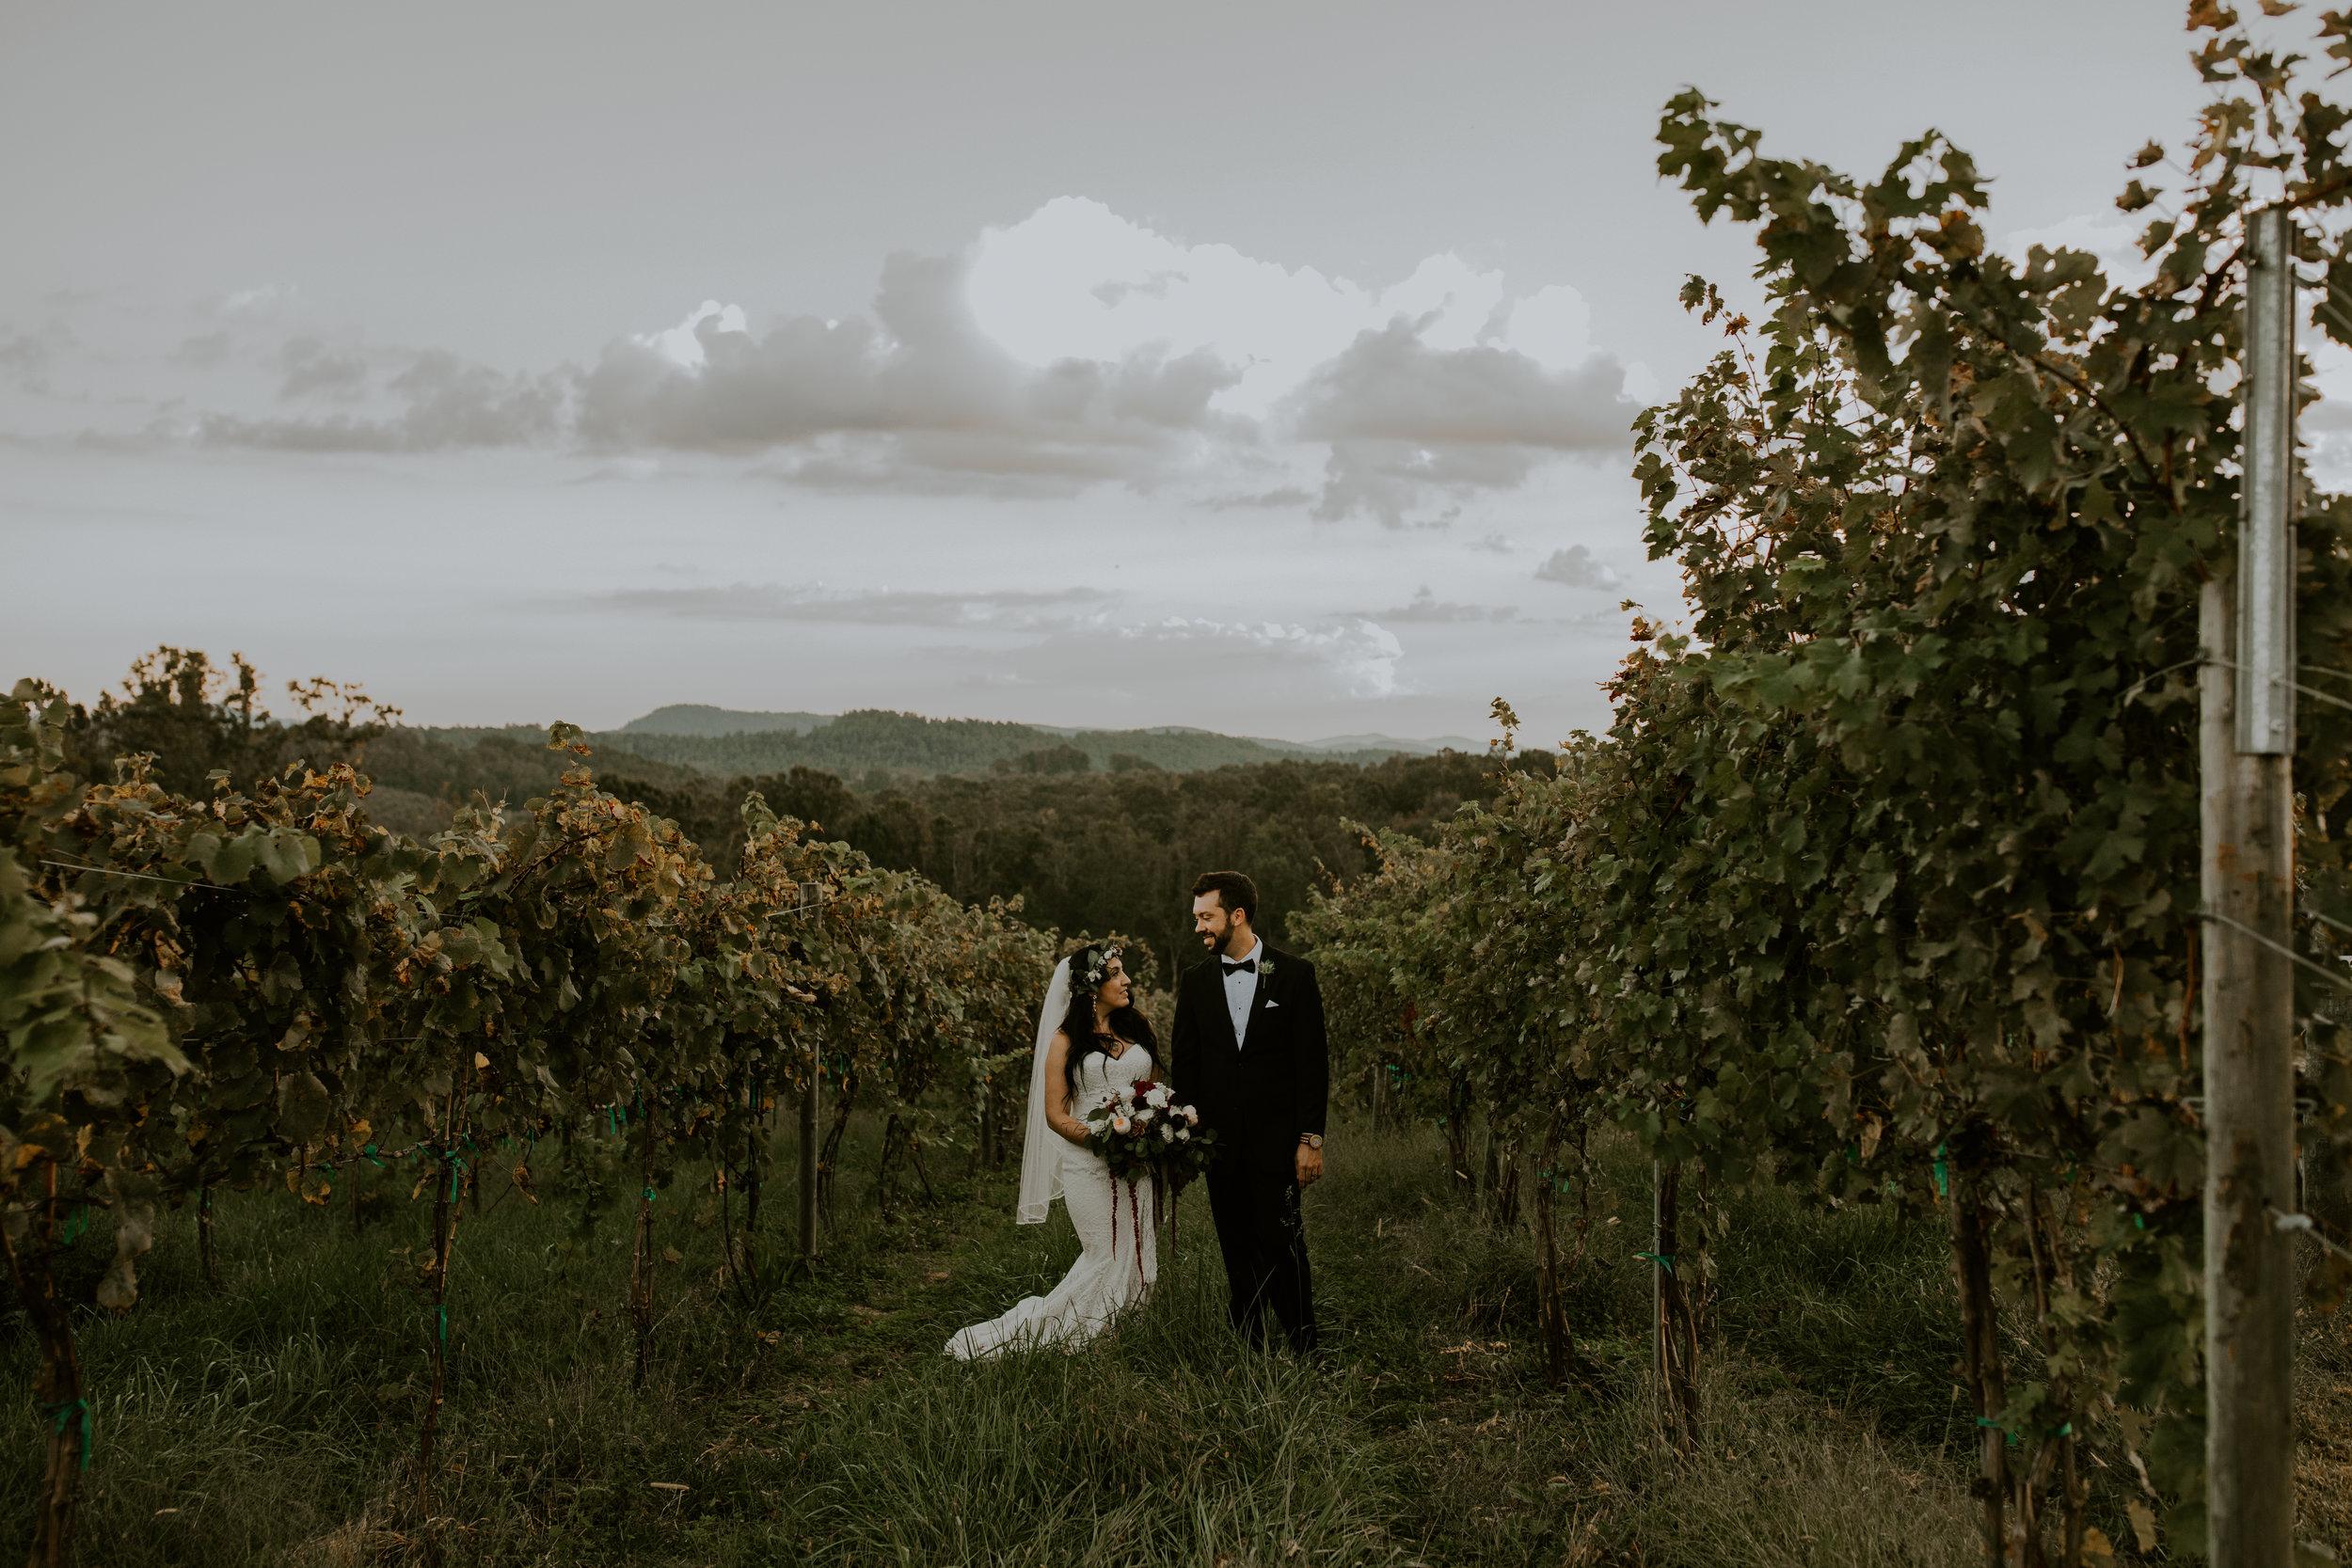 Point Lookout Vineyards Hendersonville North Carolina -Wedding-Renee and Jason-78.JPG